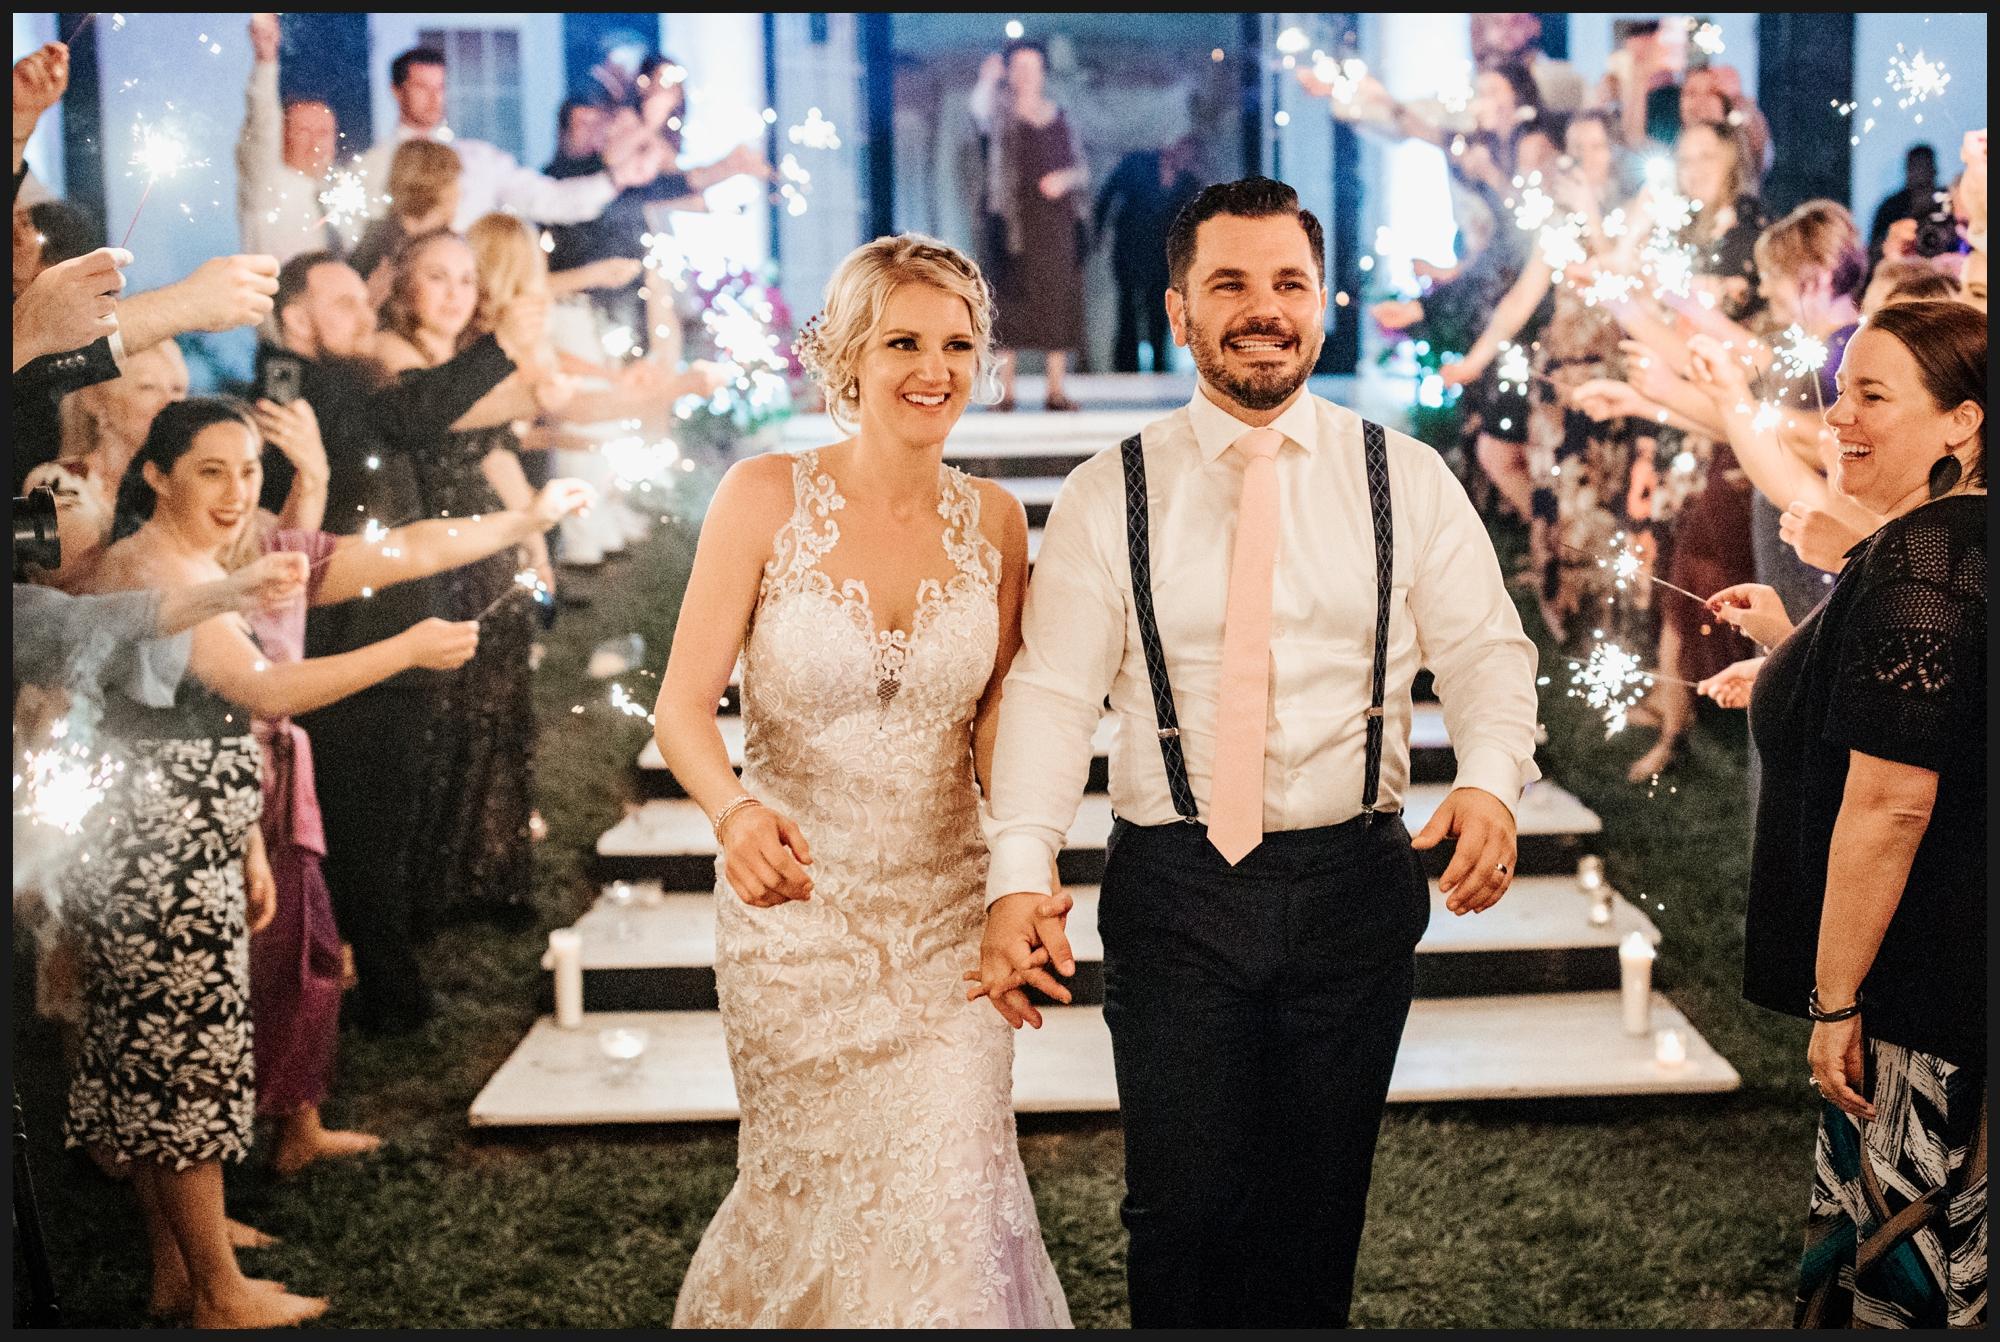 Orlando-Wedding-Photographer-destination-wedding-photographer-florida-wedding-photographer-hawaii-wedding-photographer_0627.jpg